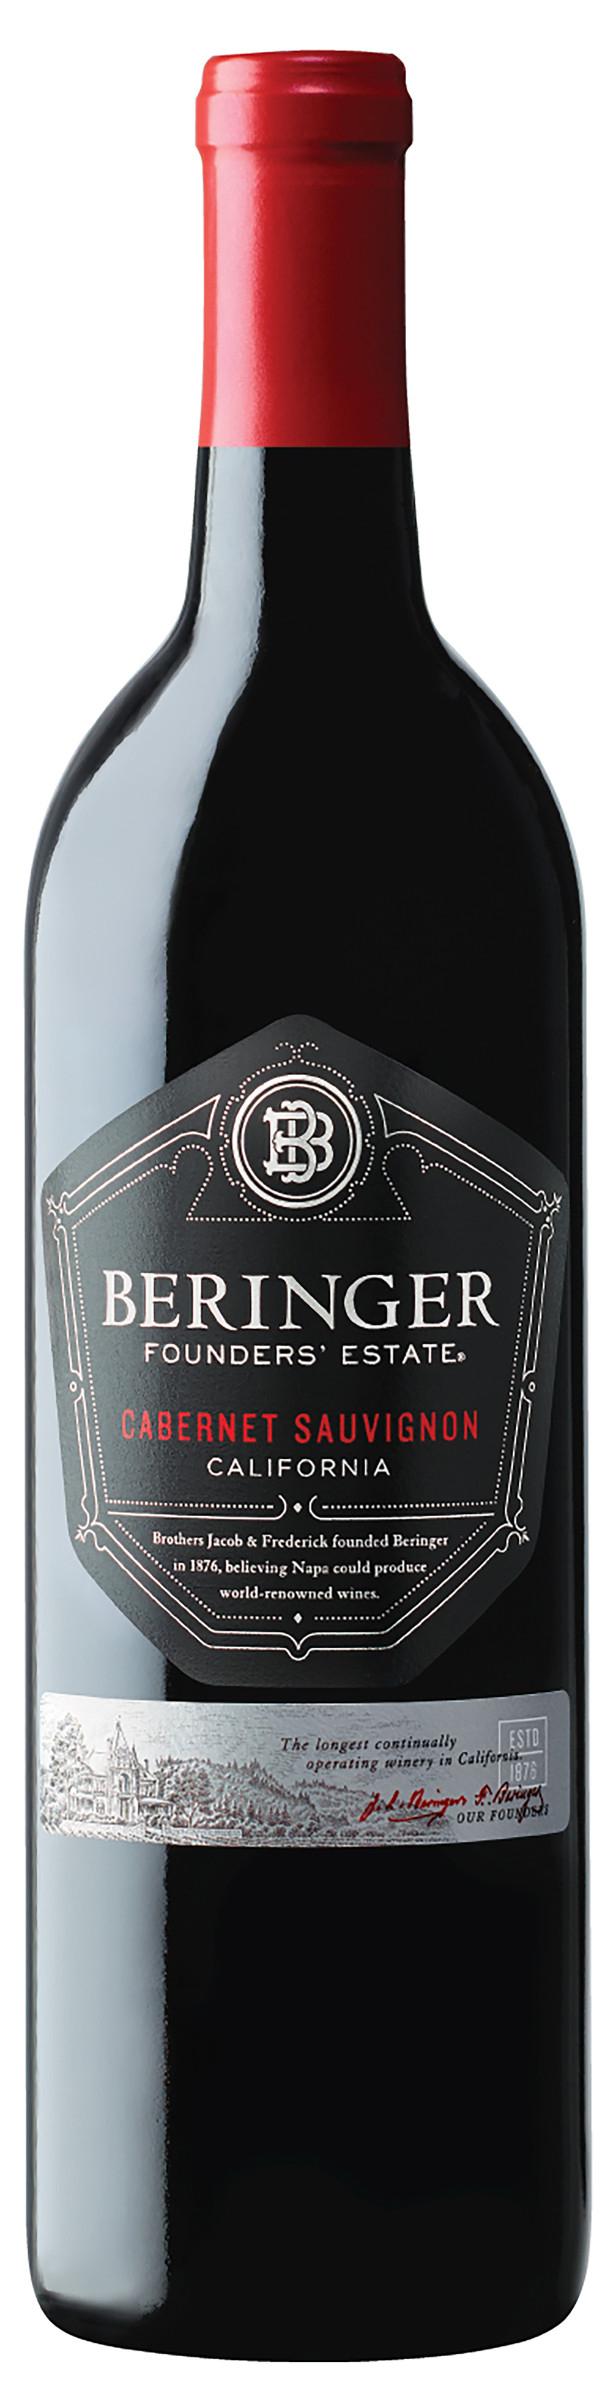 Beringer Founders' Estate, Cabernet Sauvignon